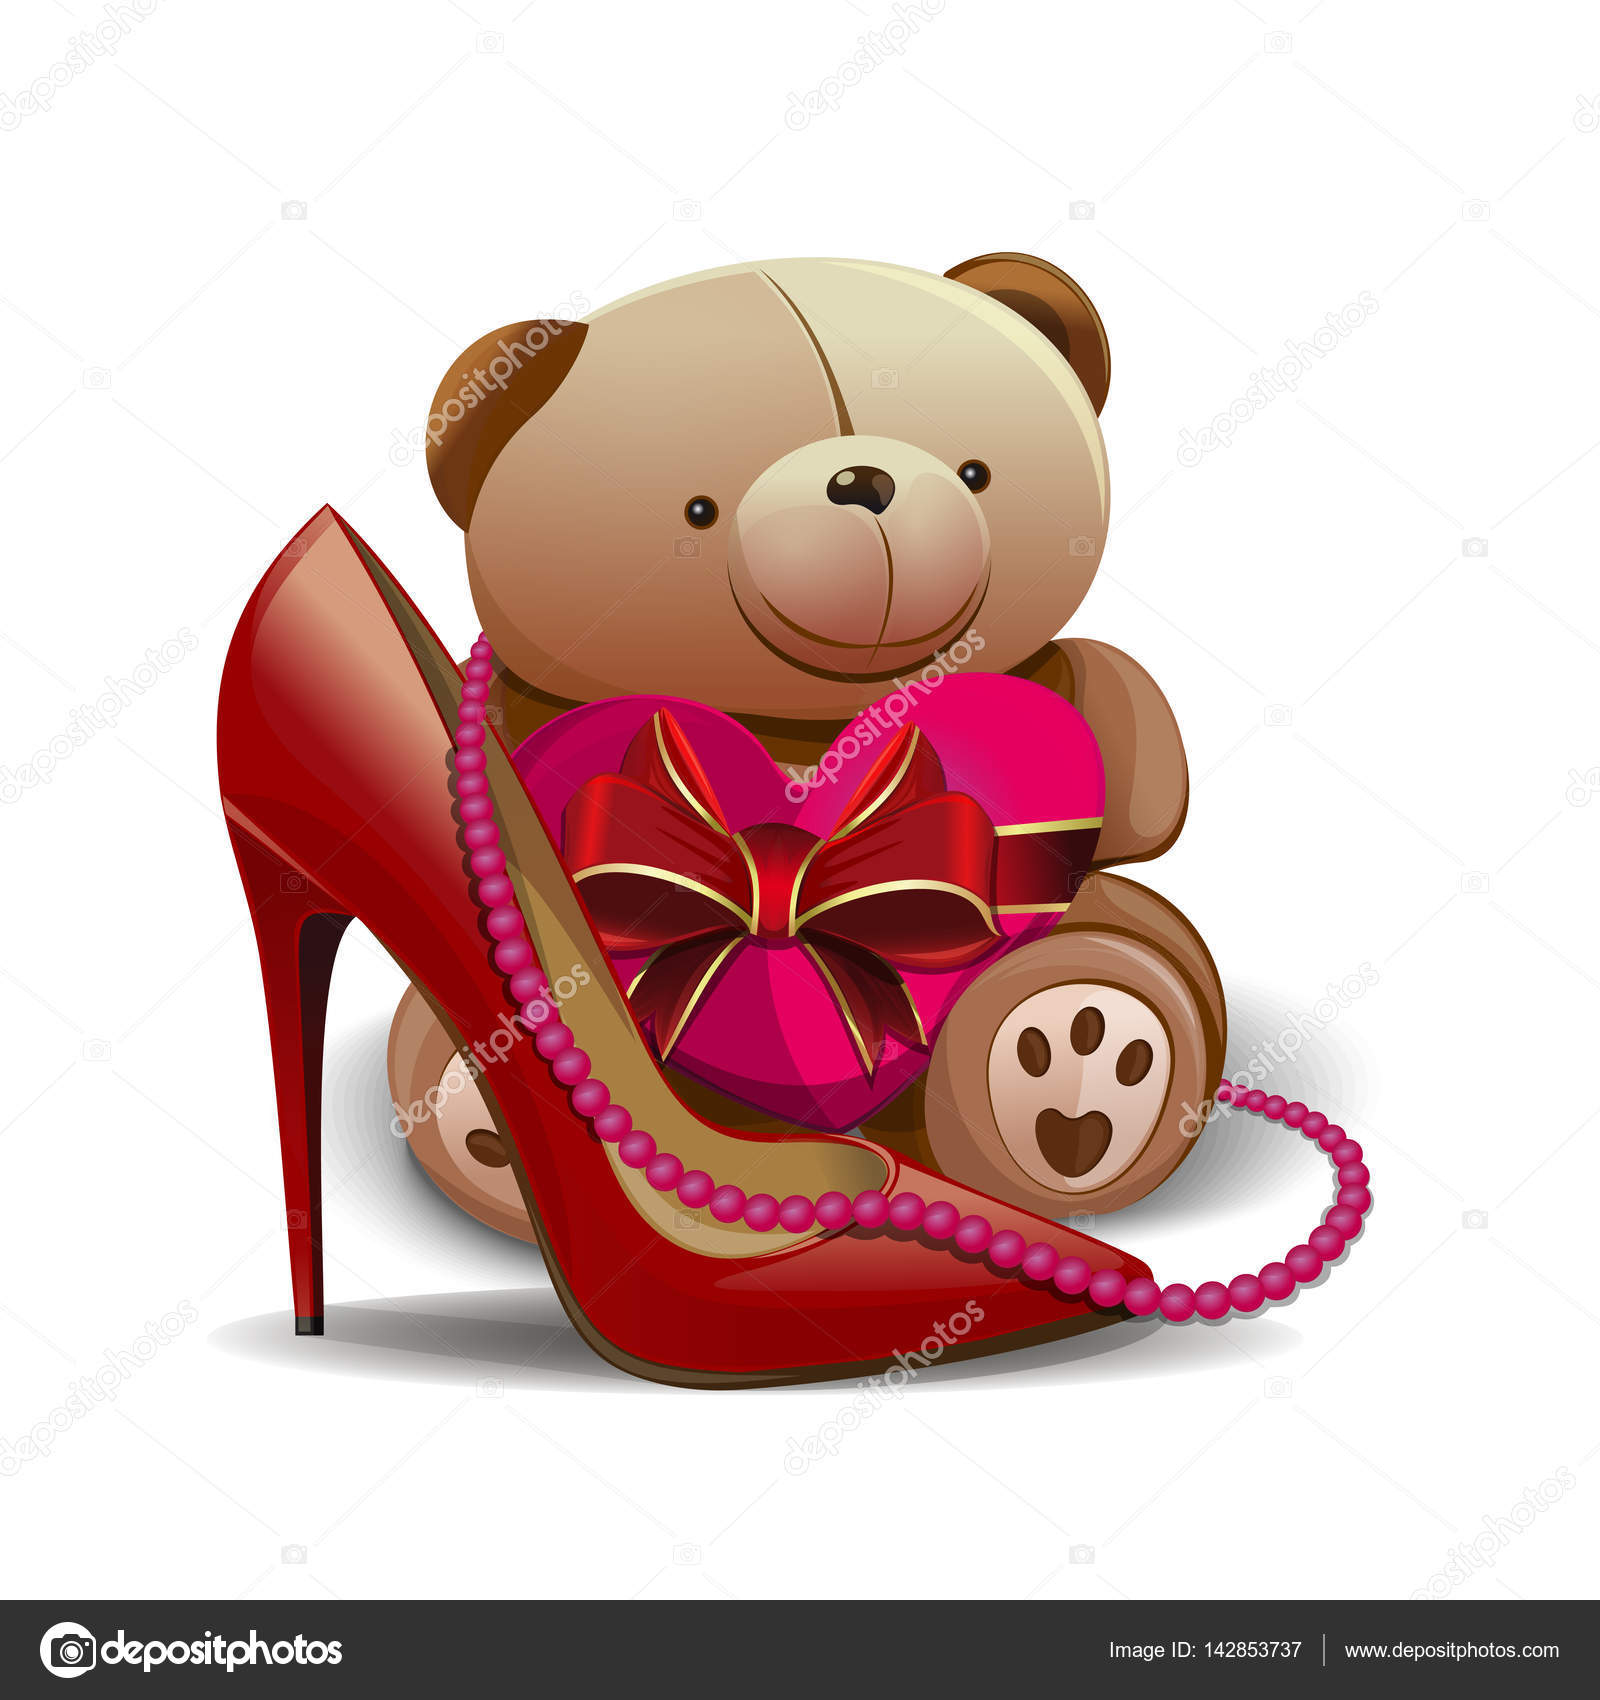 women shoe pink beads teddy bear heart design elements for